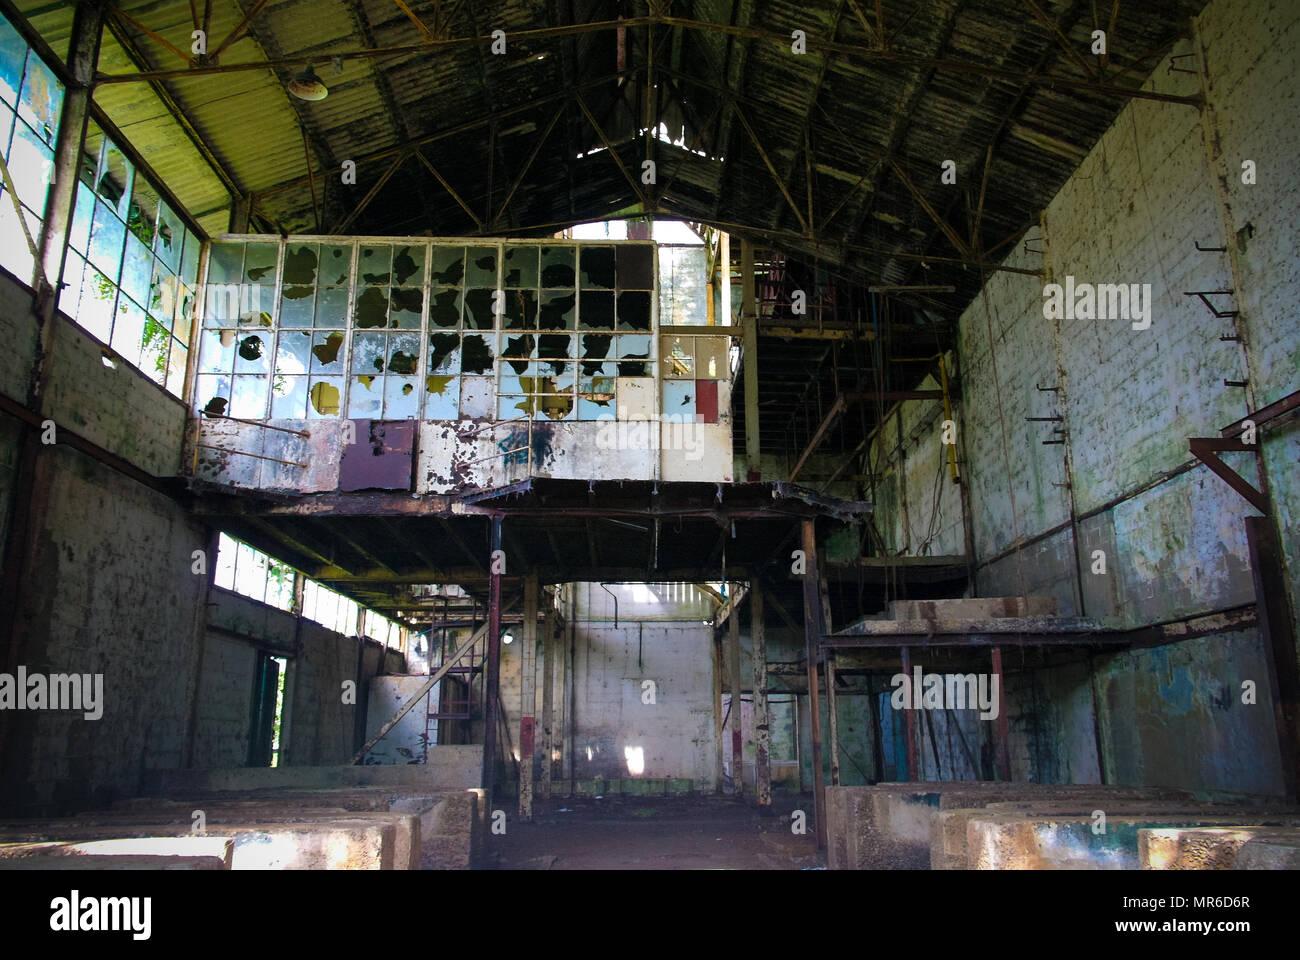 Former rum factory at Marienburg in Suriname - Stock Image